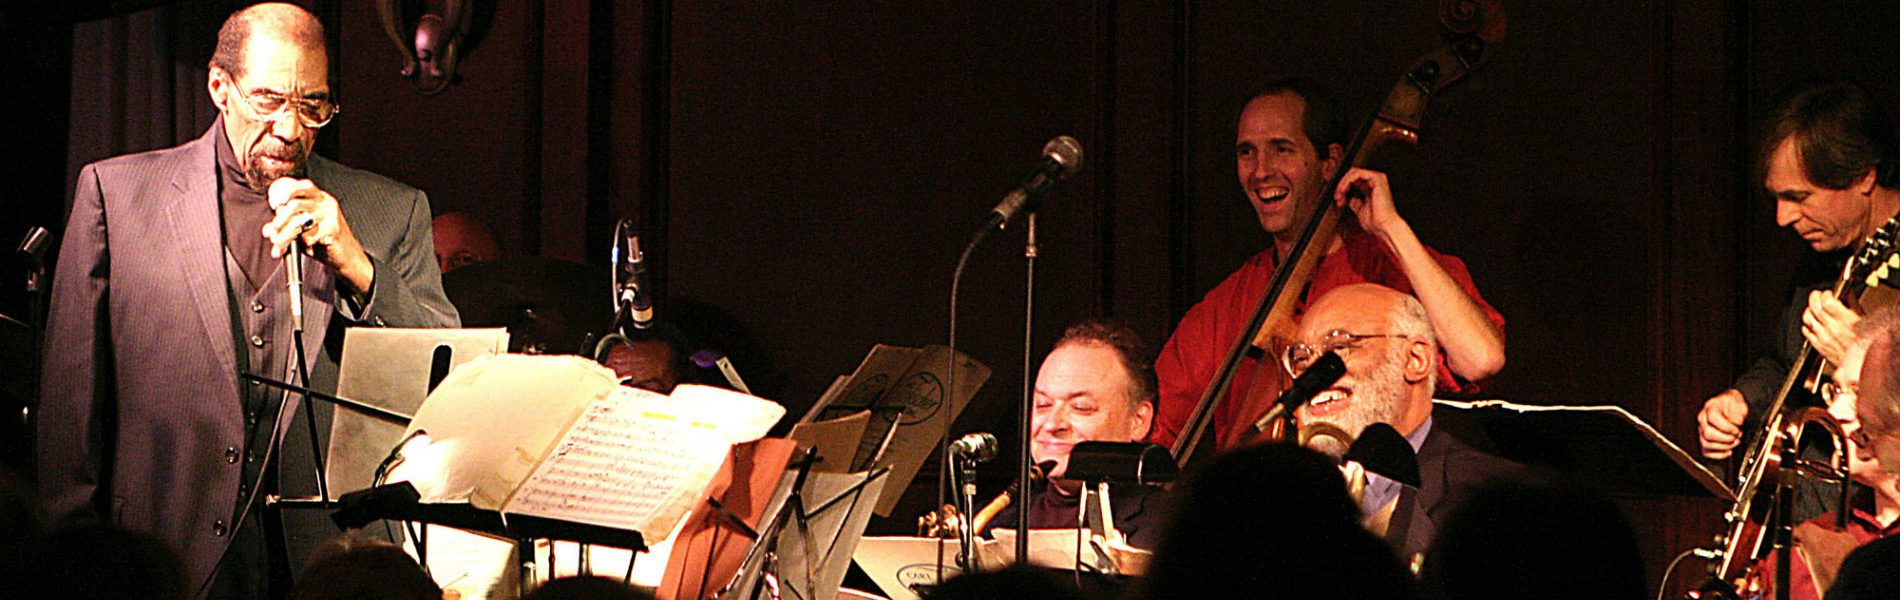 The Aardvark Jazz Orchestra, since 1972